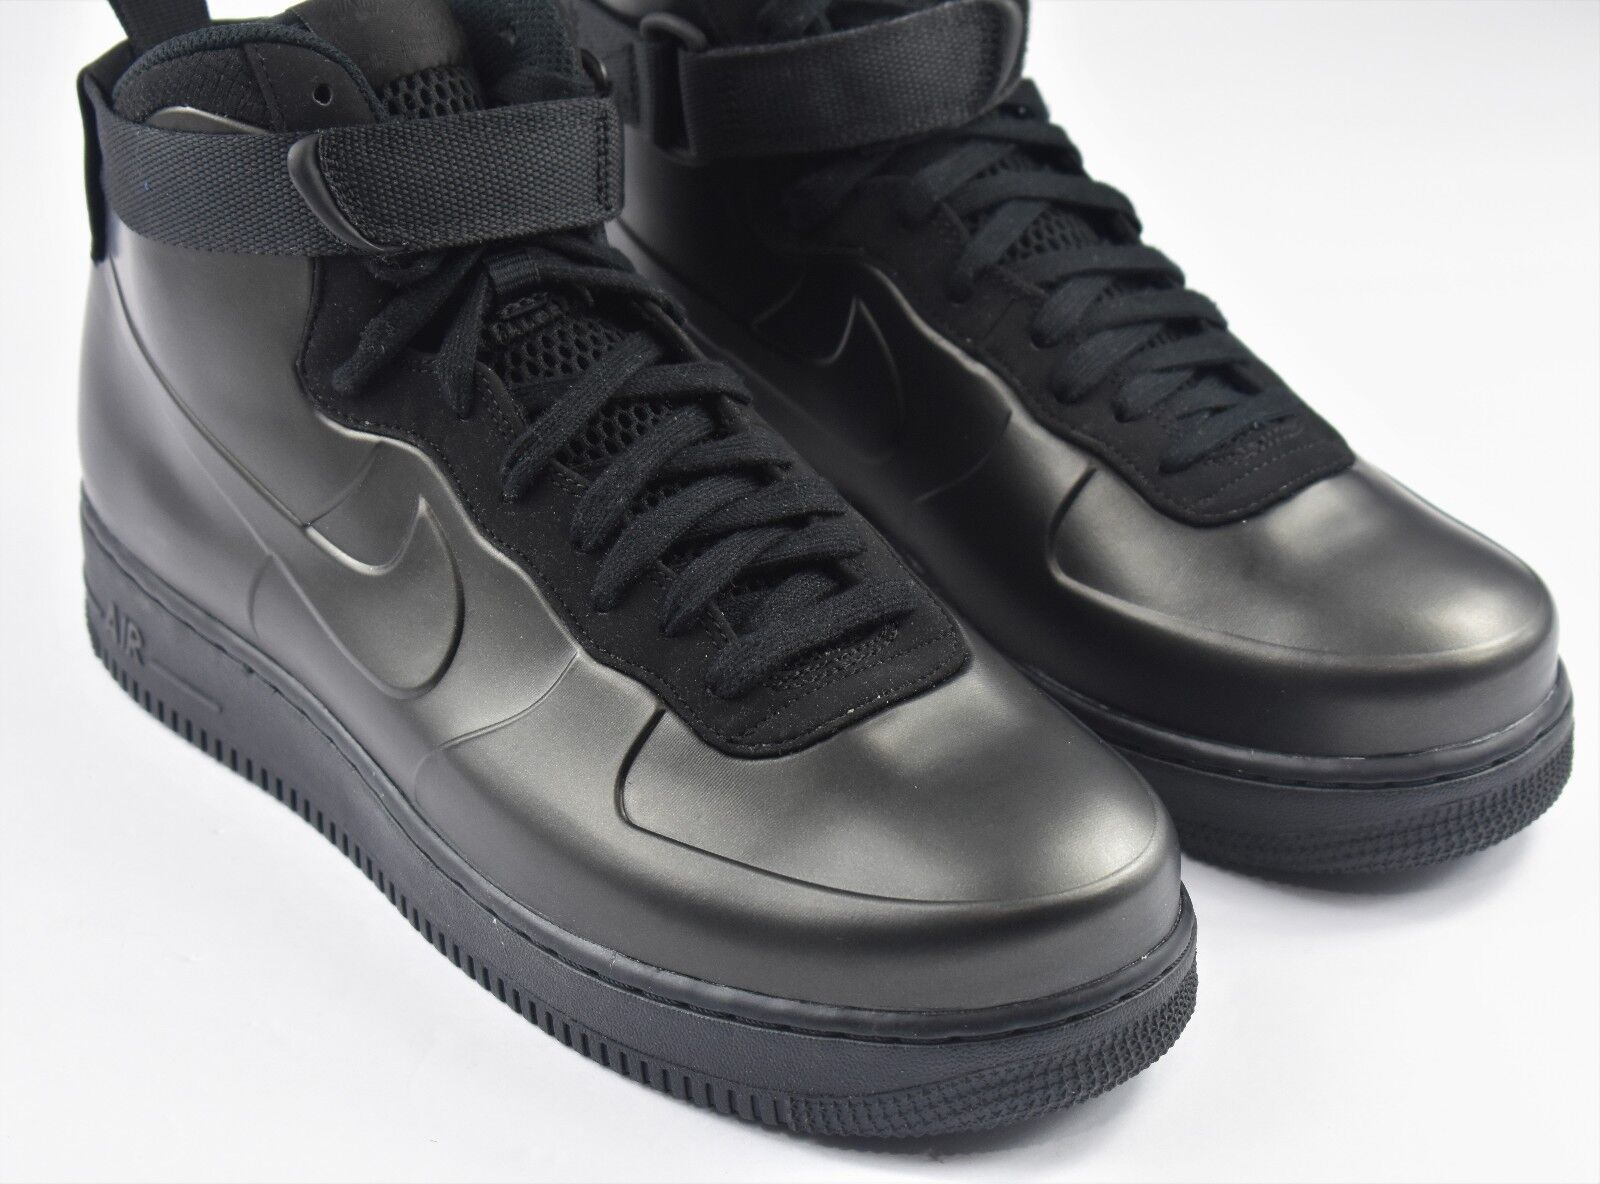 bf5f0517 Спортивная обувь для мужчины Nike Air Force 1 Foamposite Cupsole Mens Size  9.5 Shoes Triple Black AH6771 001 - 202300919868 - купить на eBay.com (США)  с ...